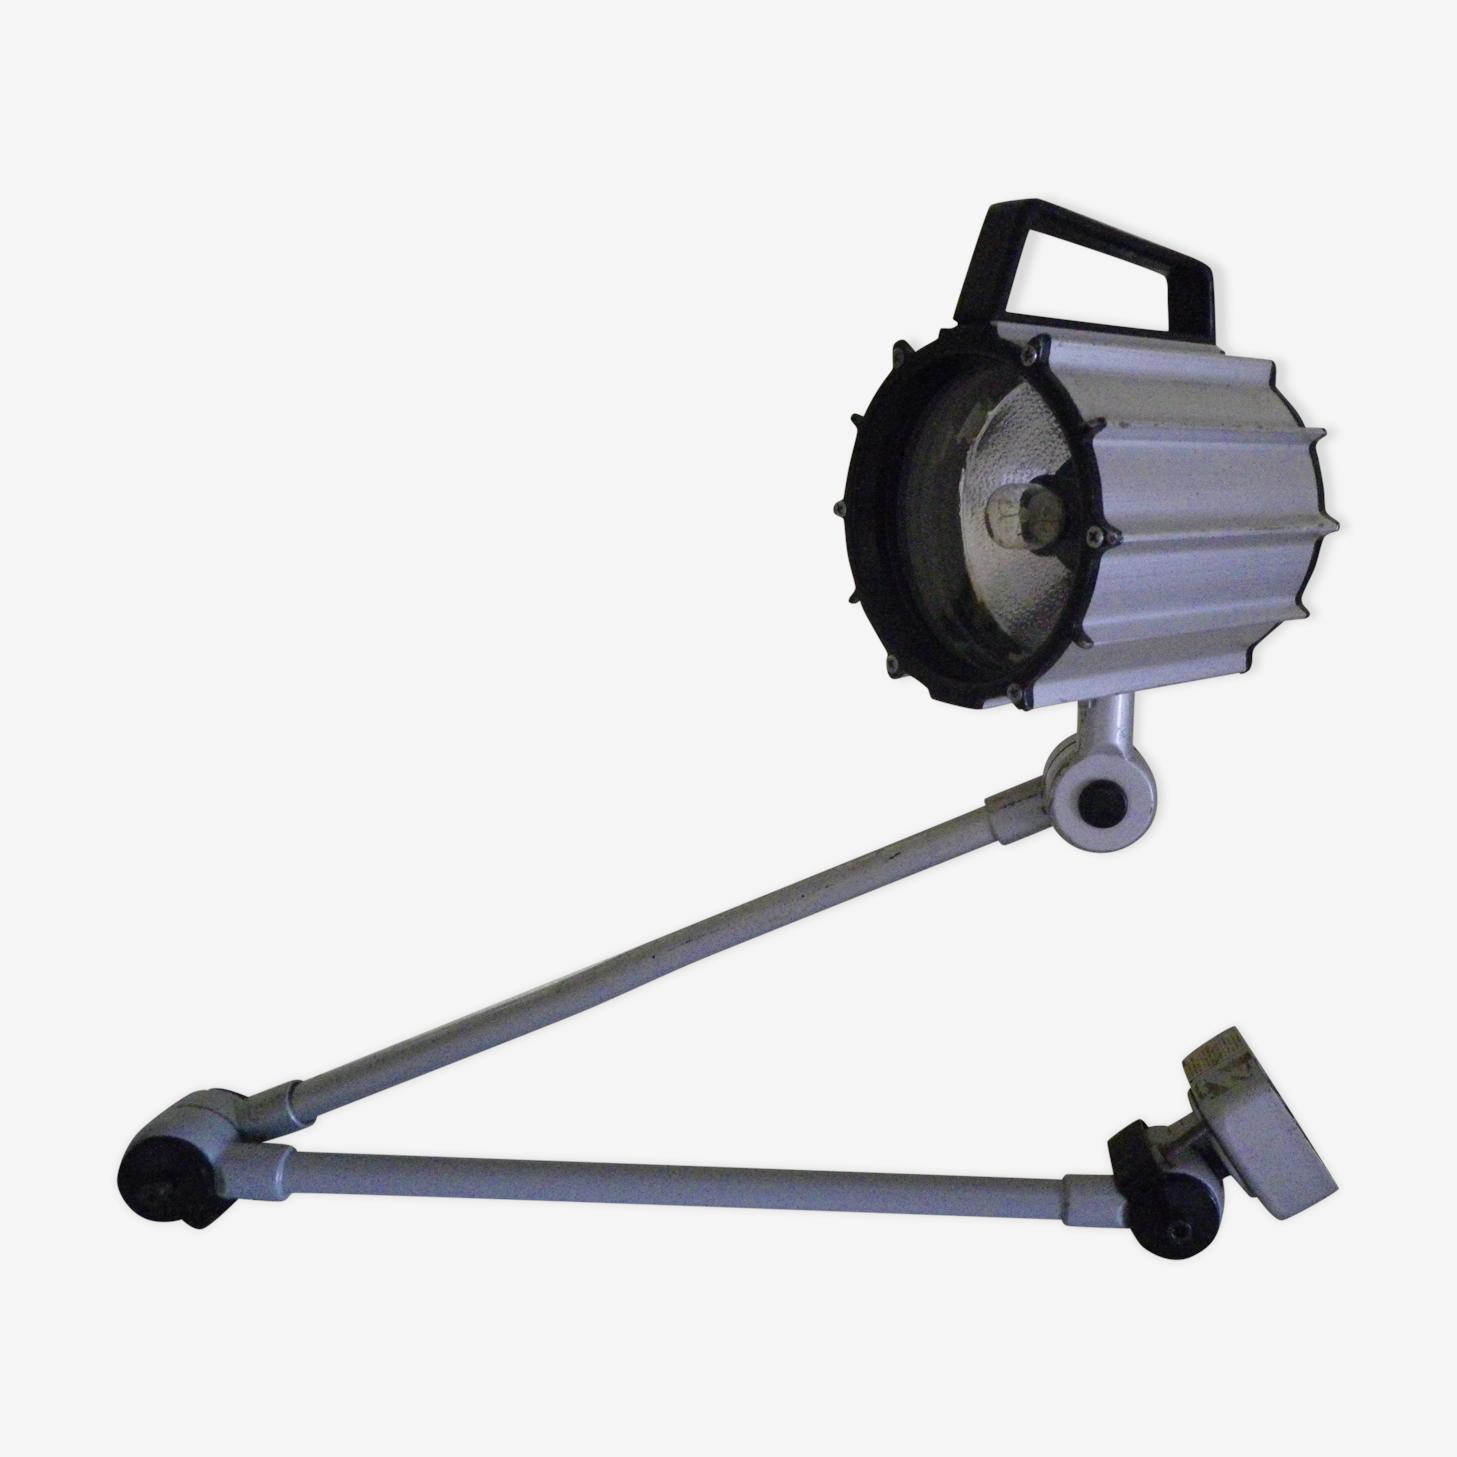 Lampe Industrielle De Machine Outil 2 Bras Articules Waldmann